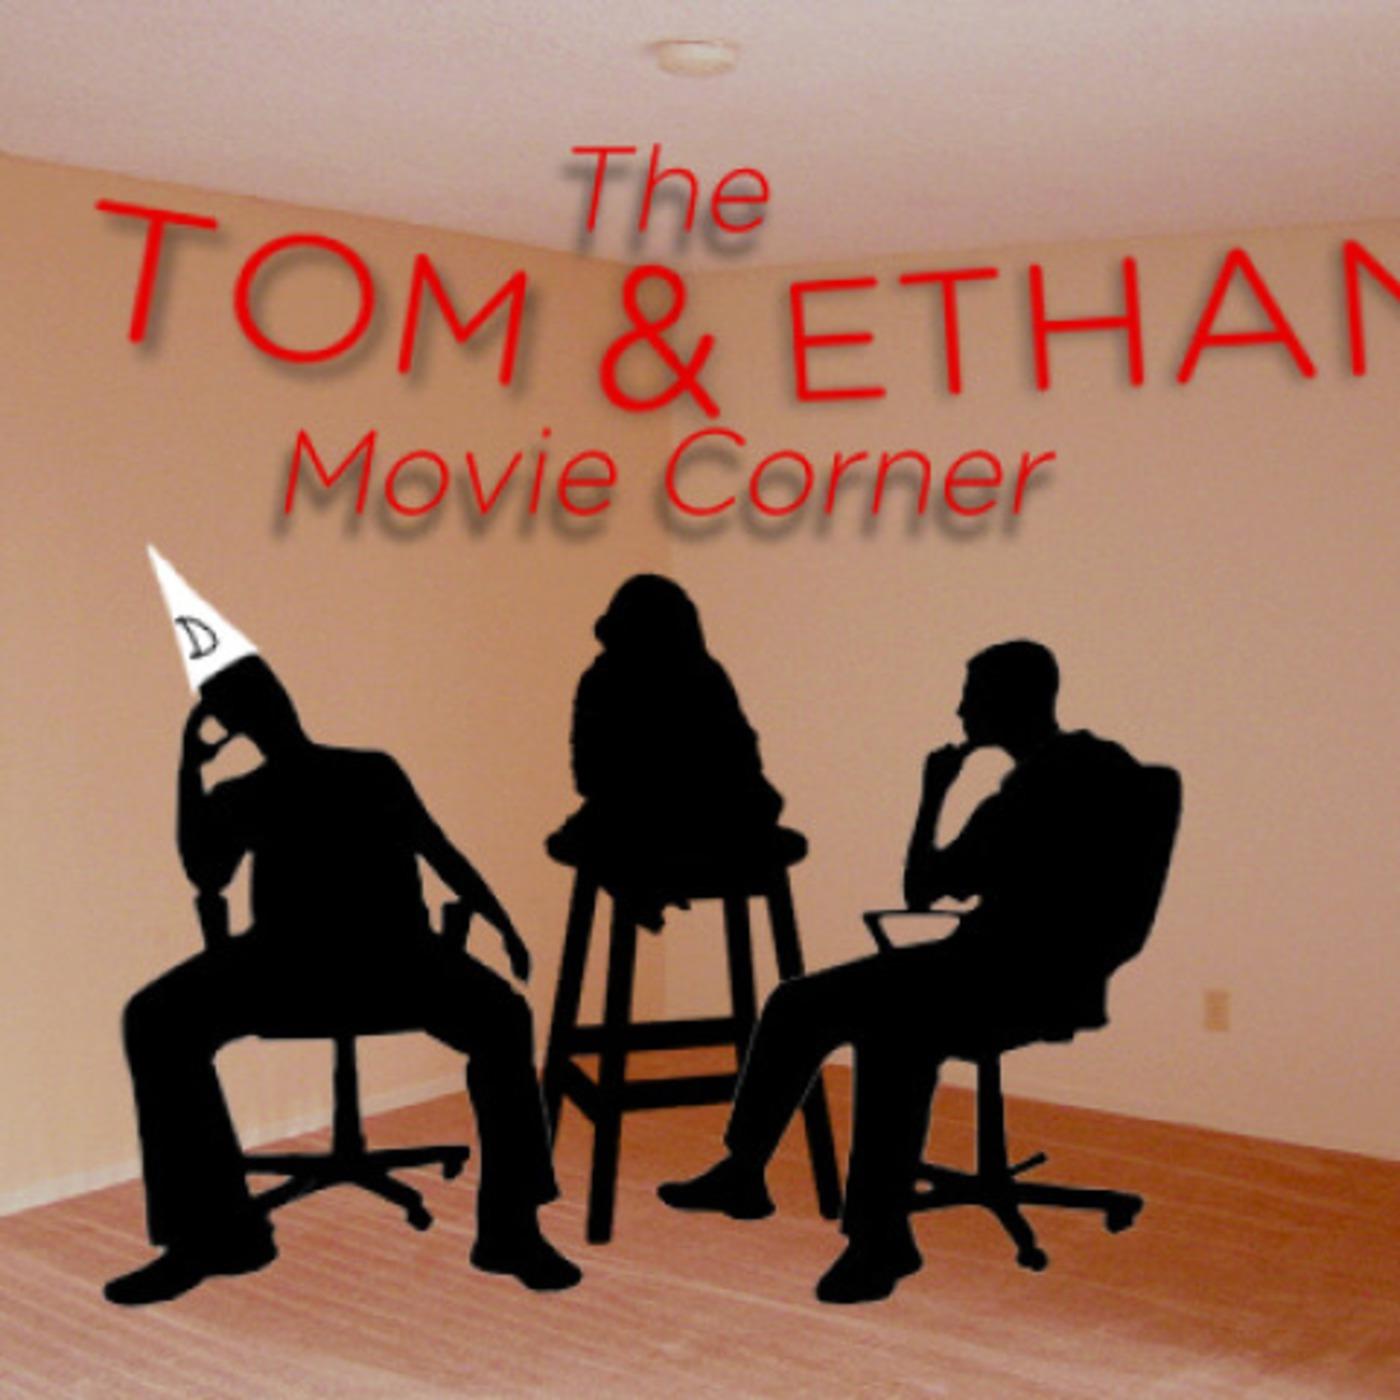 The Tom & Ethan Movie Corner